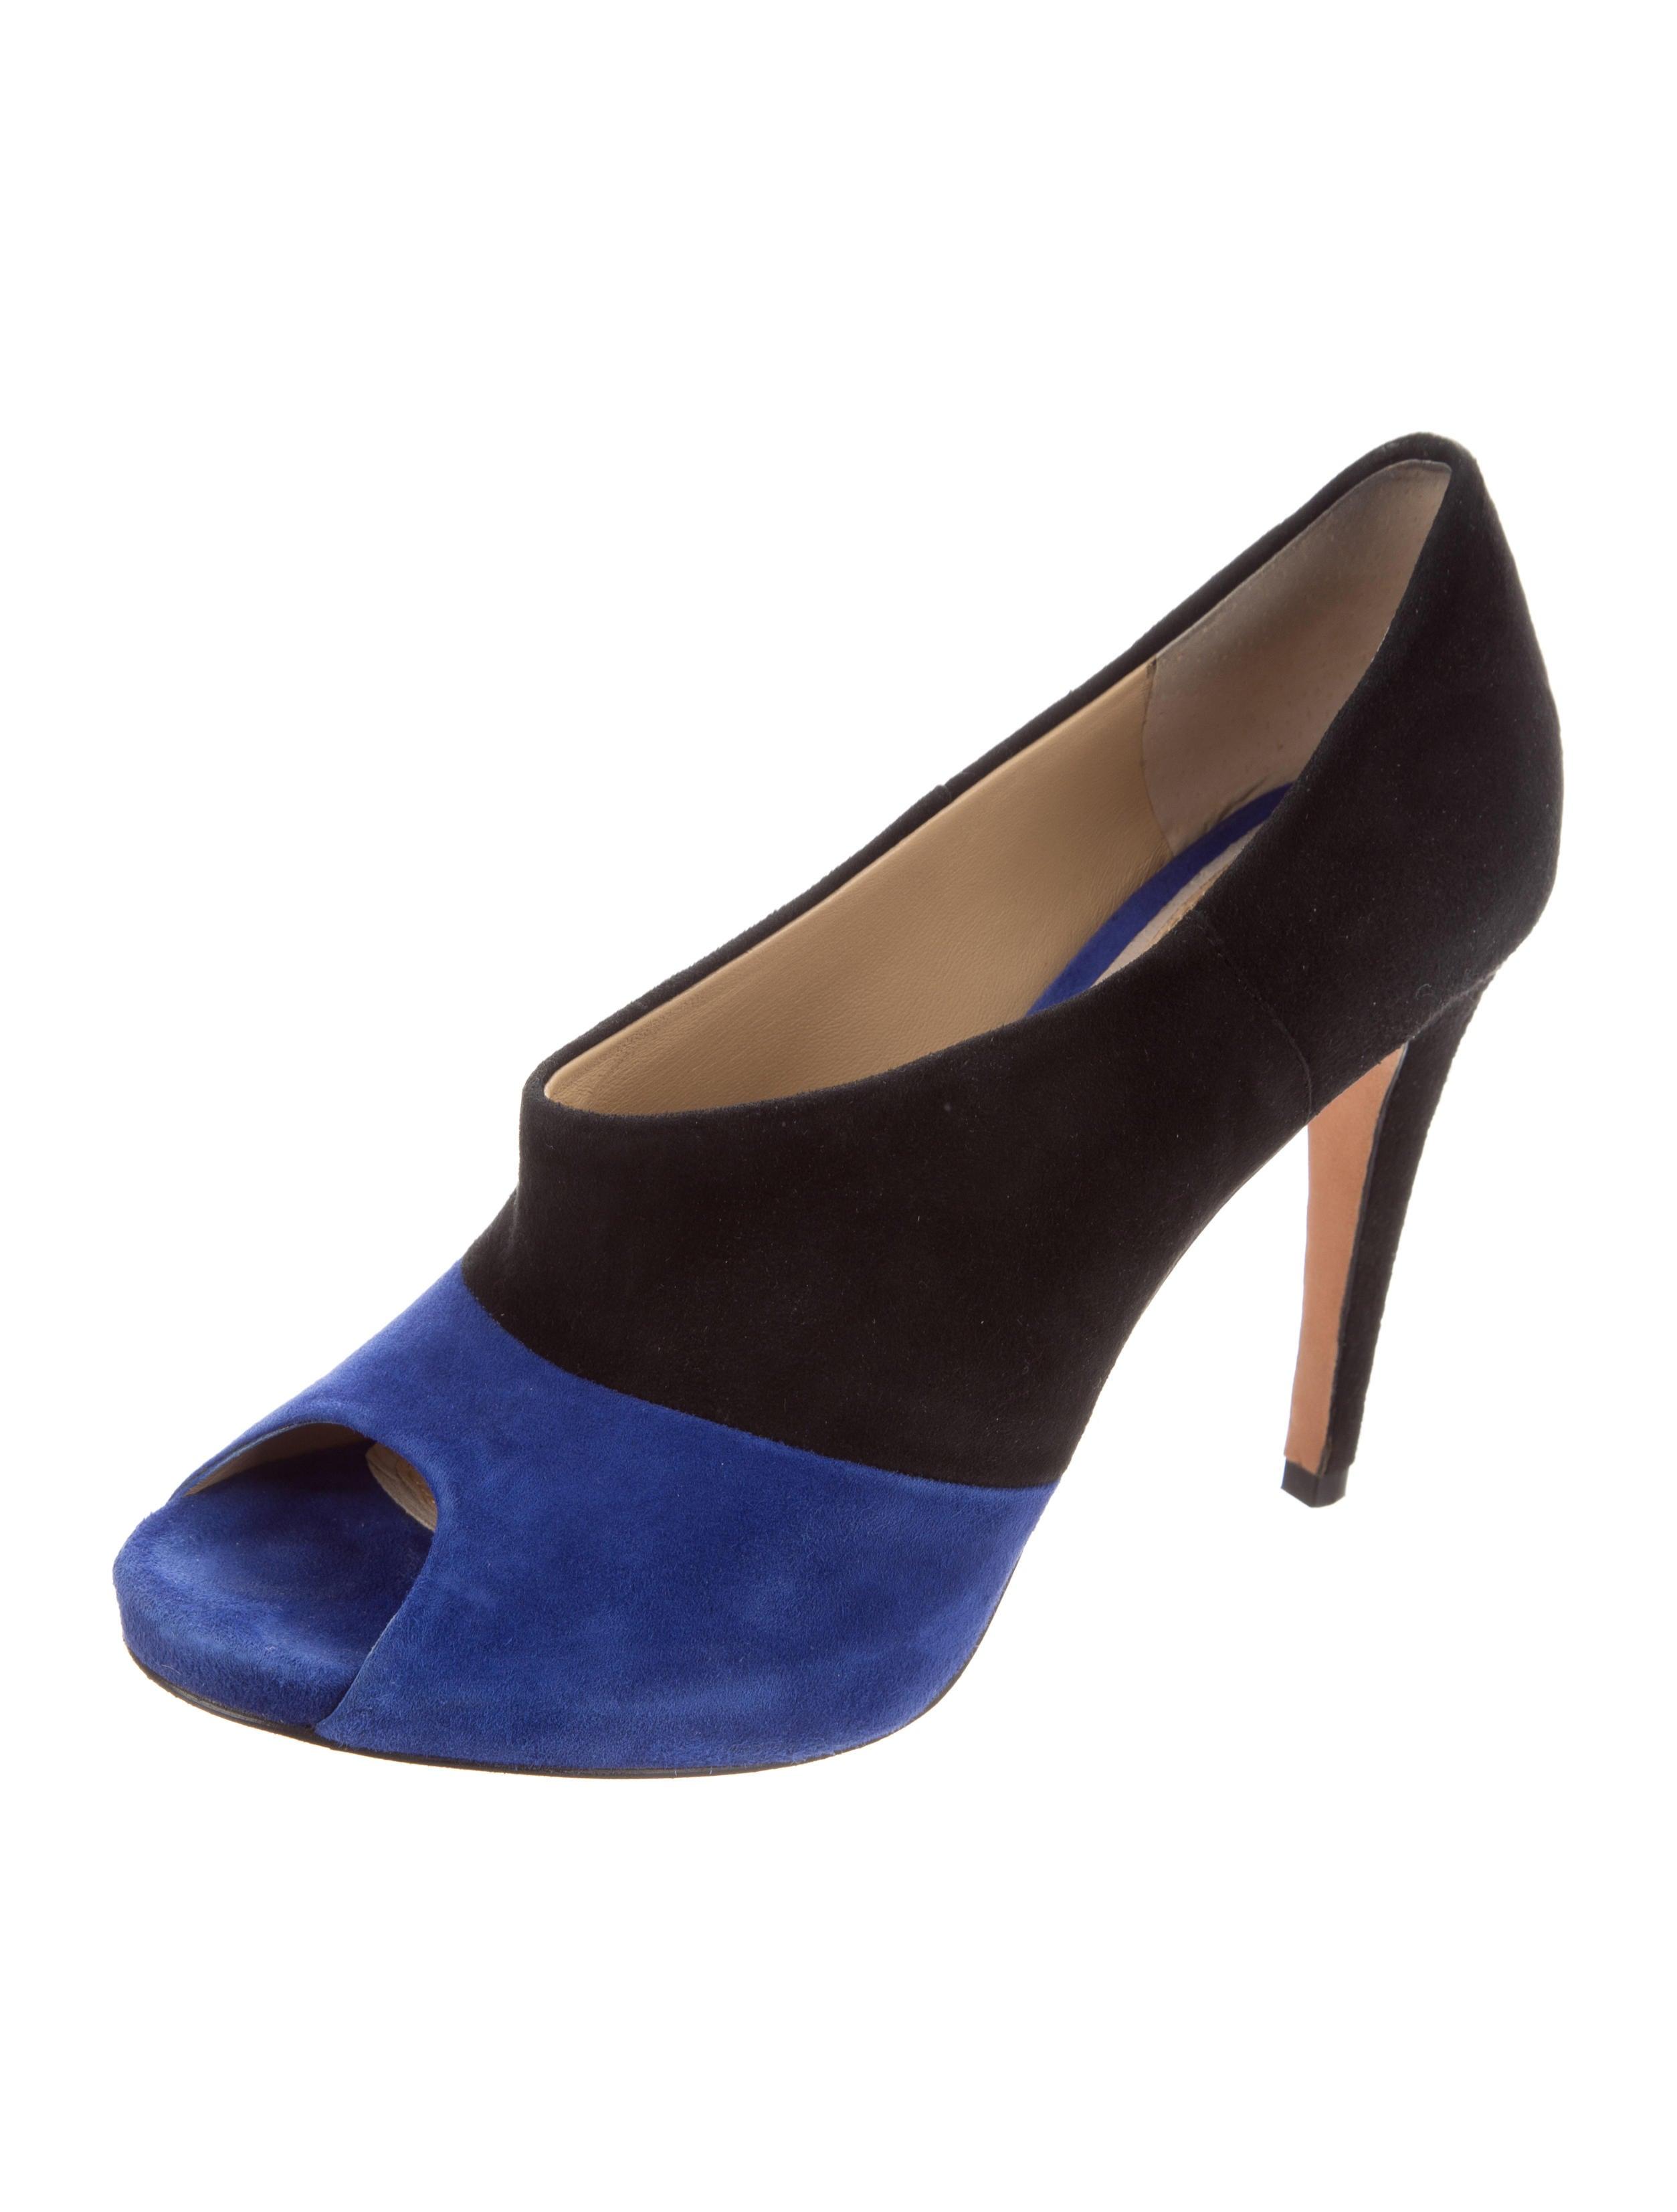 free shipping sast Diane von Furstenberg Judith Peep-Toe Booties buy online free shipping exclusive uuqxRQW0